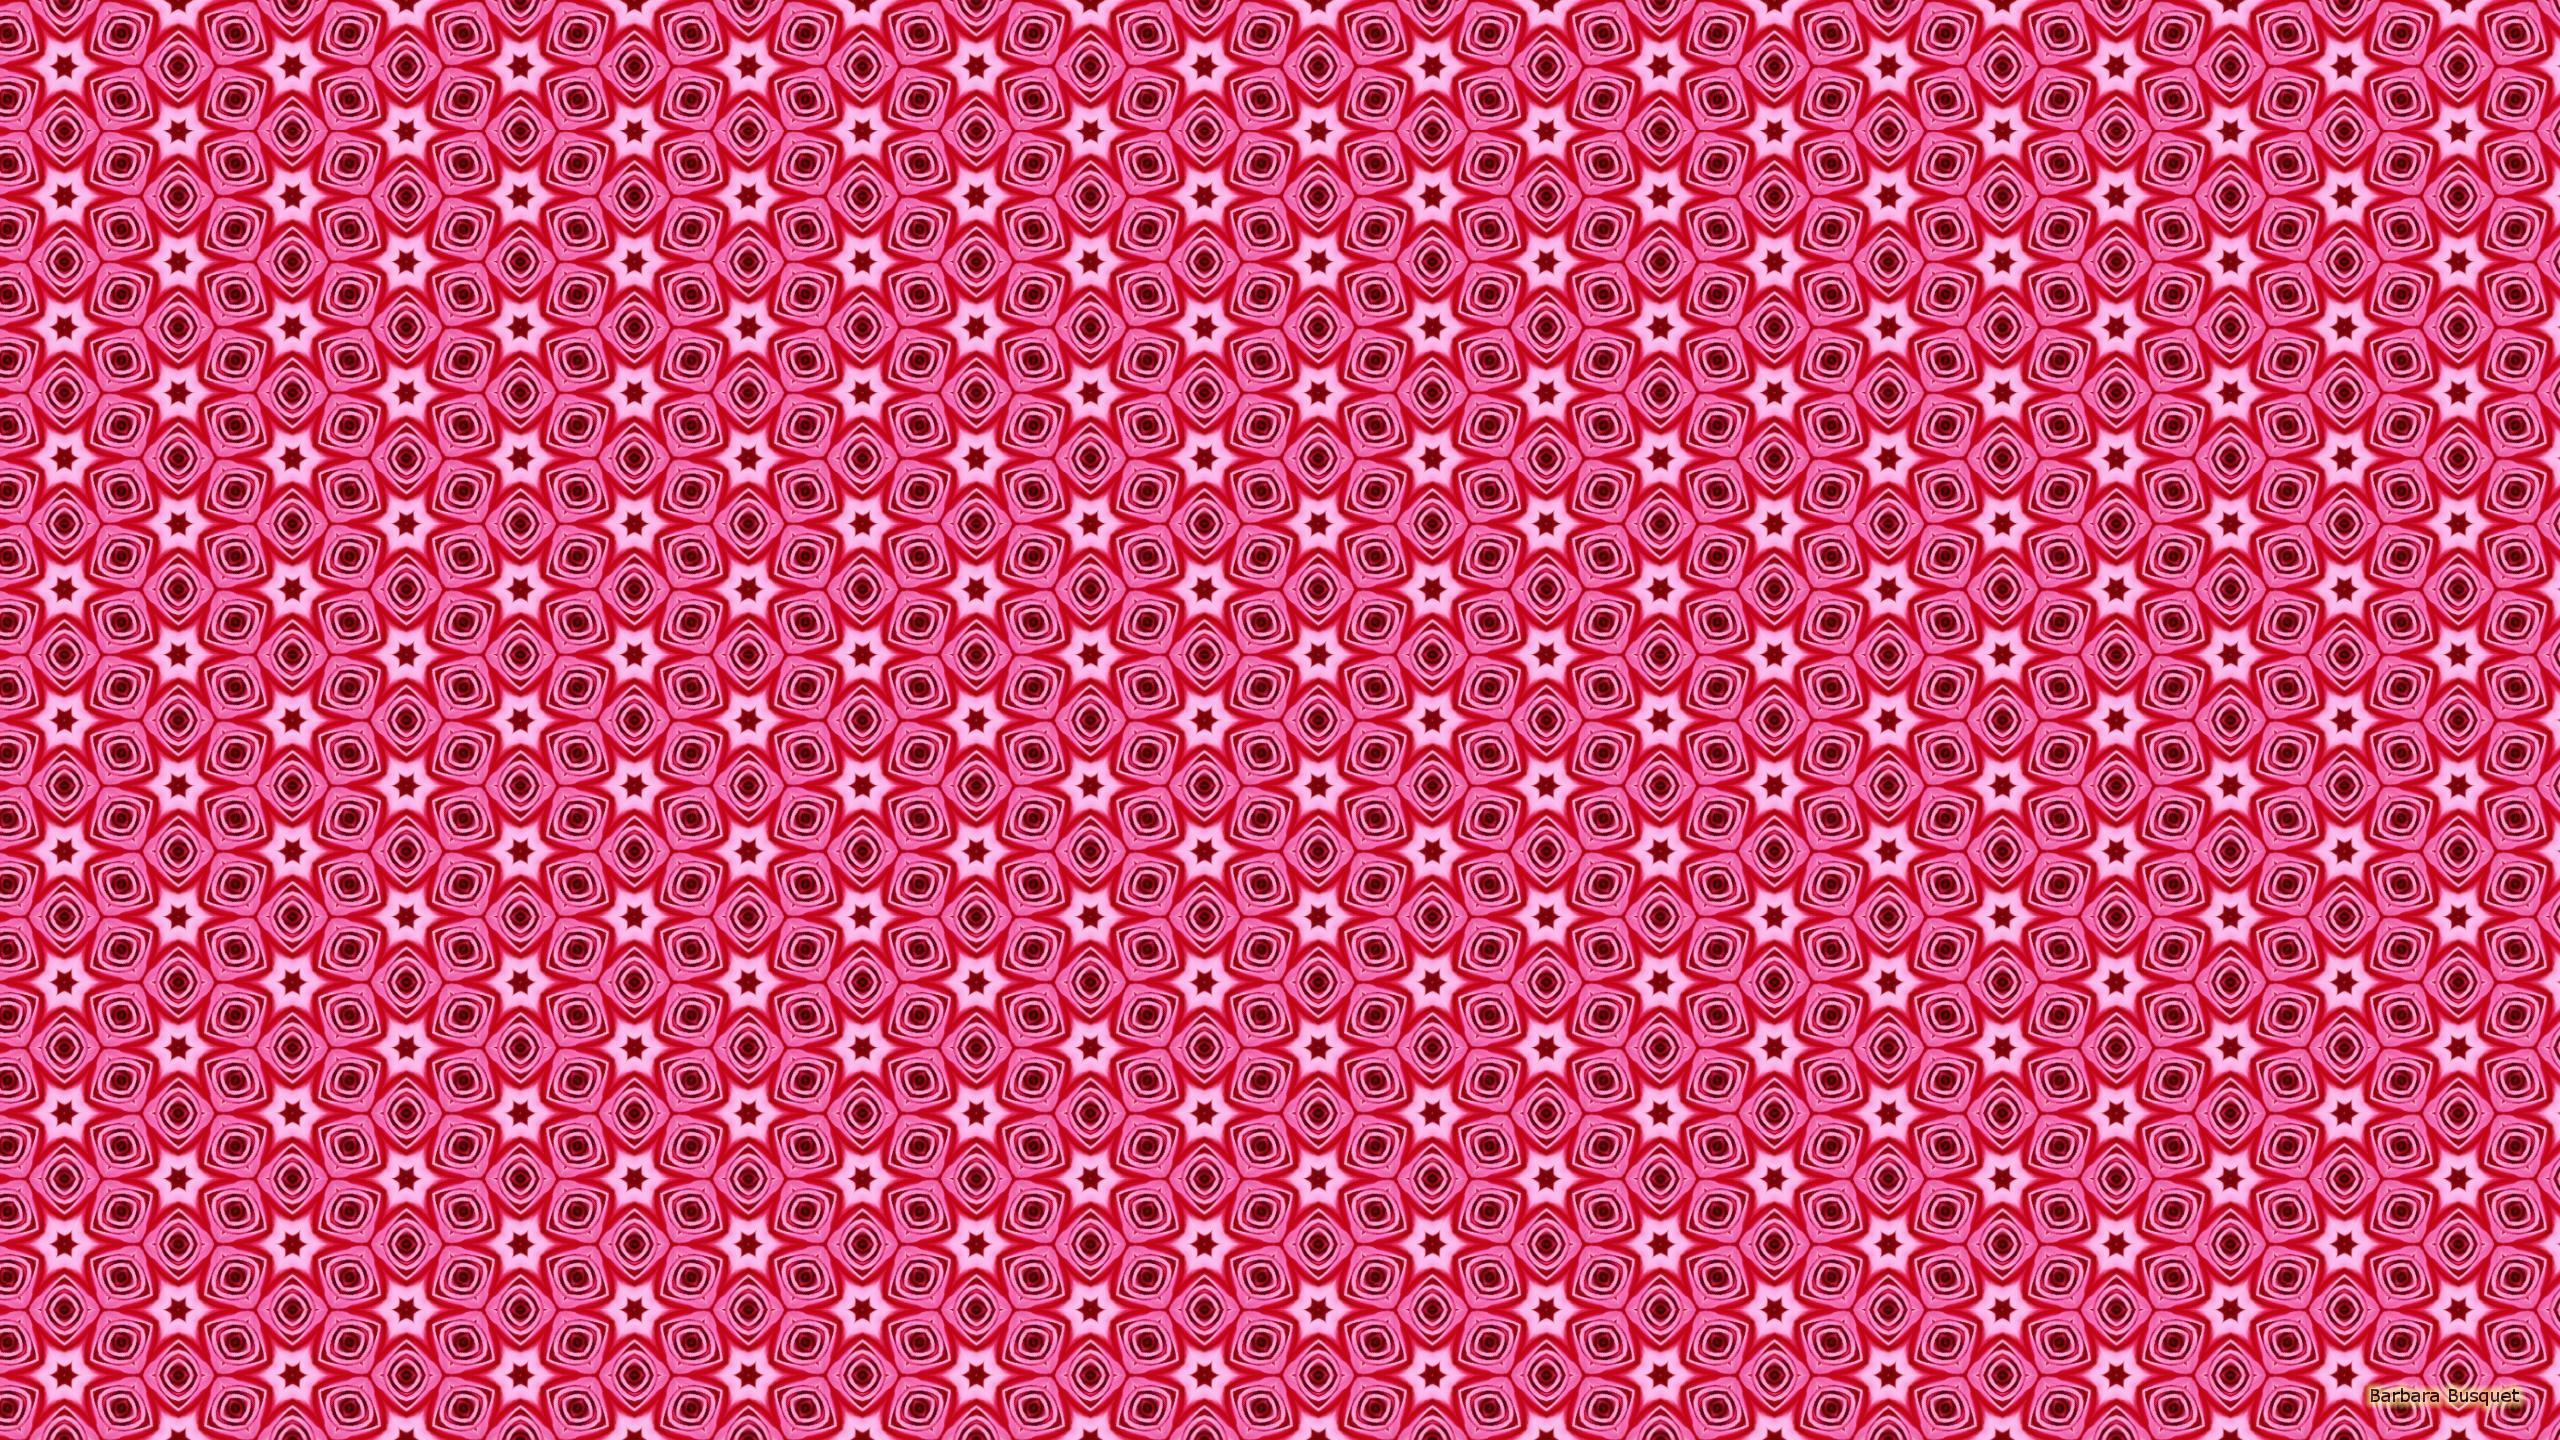 Pink Pattern Barbara S Hd Wallpapers